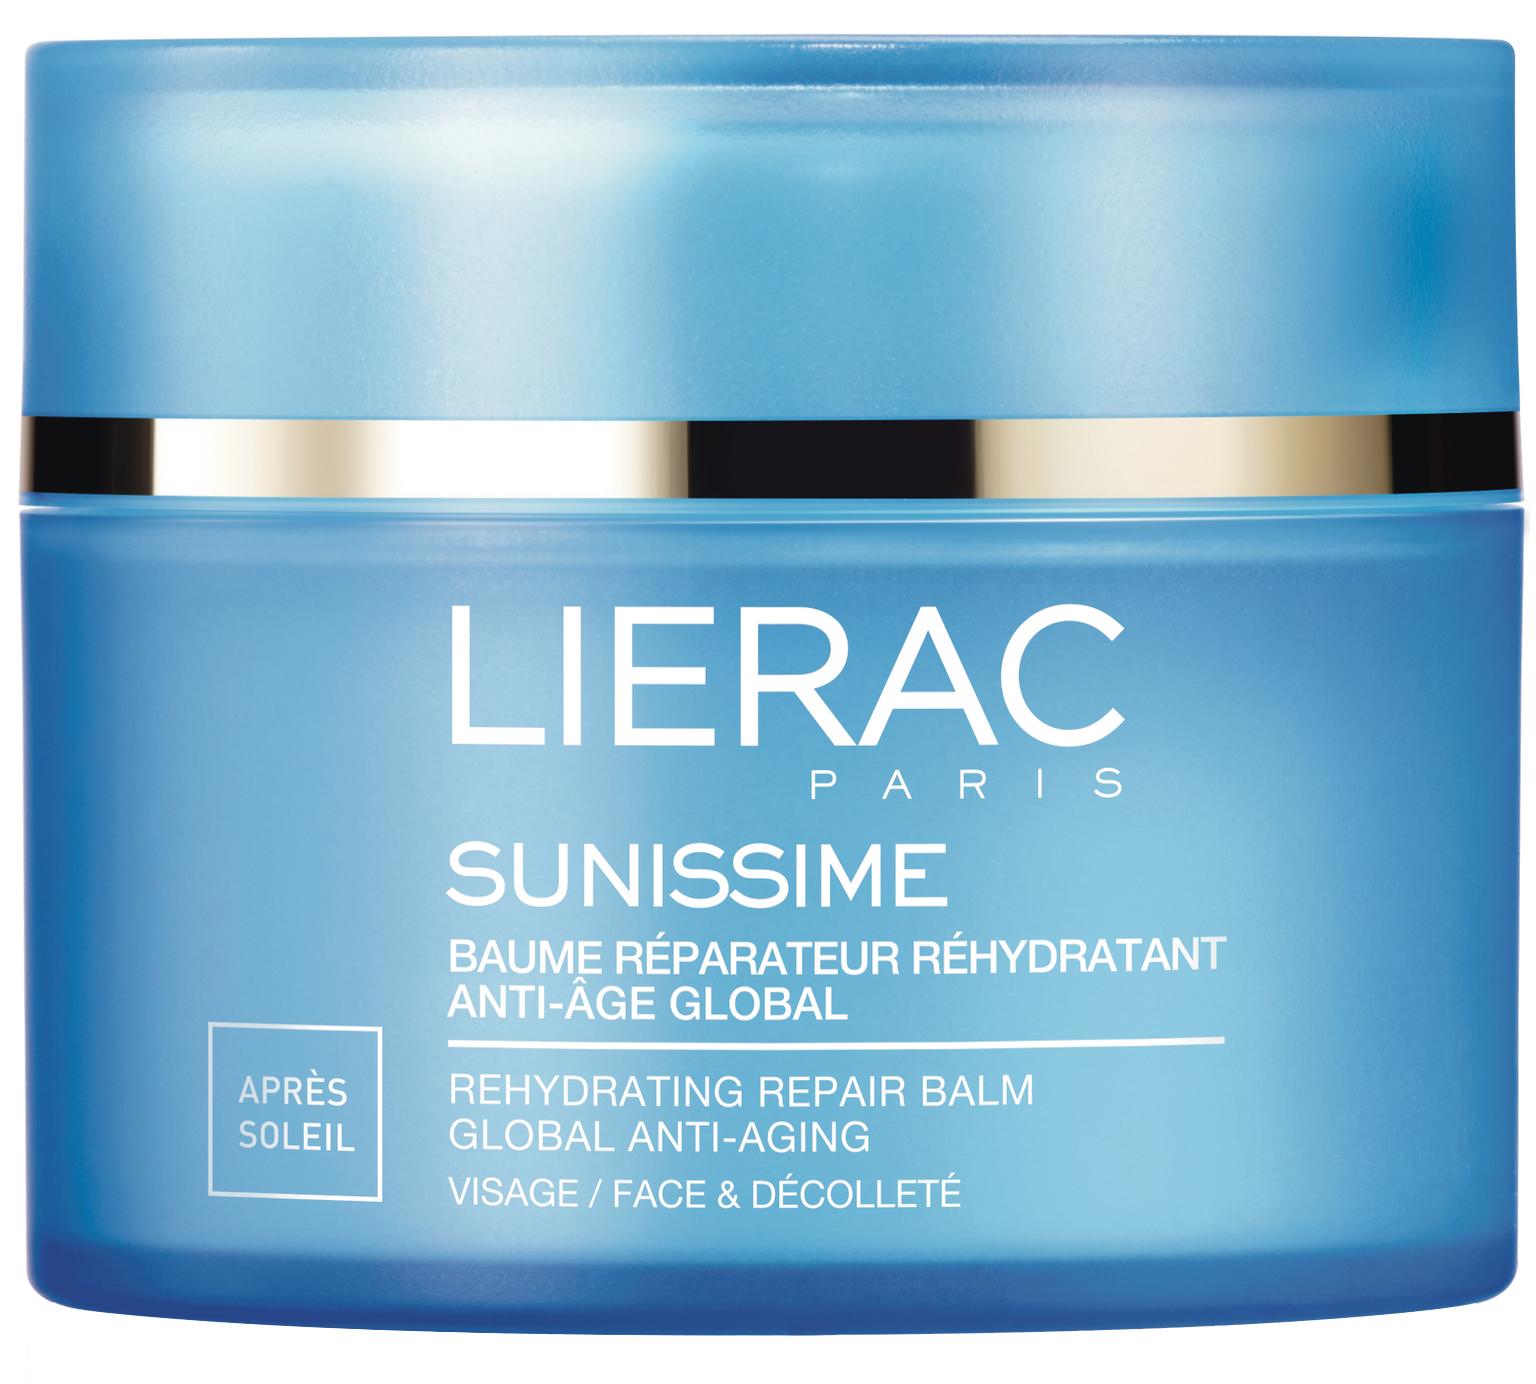 Lierac Sunissime Baume Reparateur Rehydratant Anti-Age Global Βάλσαμο Ανάπλασης Ενυδάτωσης Προσώπου για Μετά τον Ήλιο 40ml